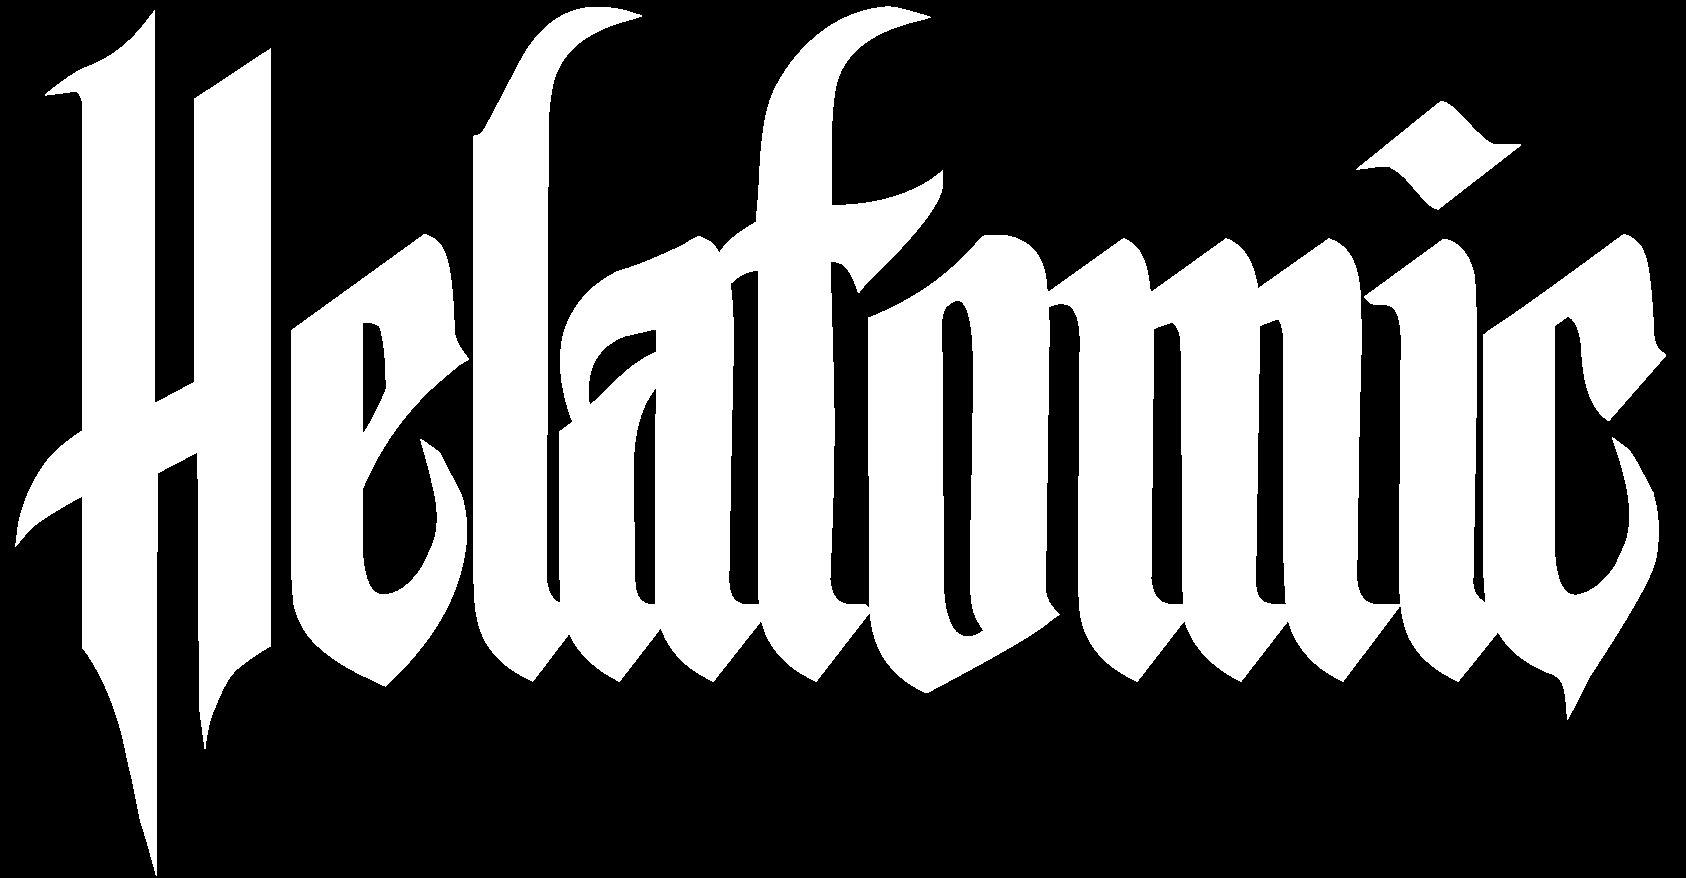 Helatomic-Typeface-Blackletter-2018-White.png